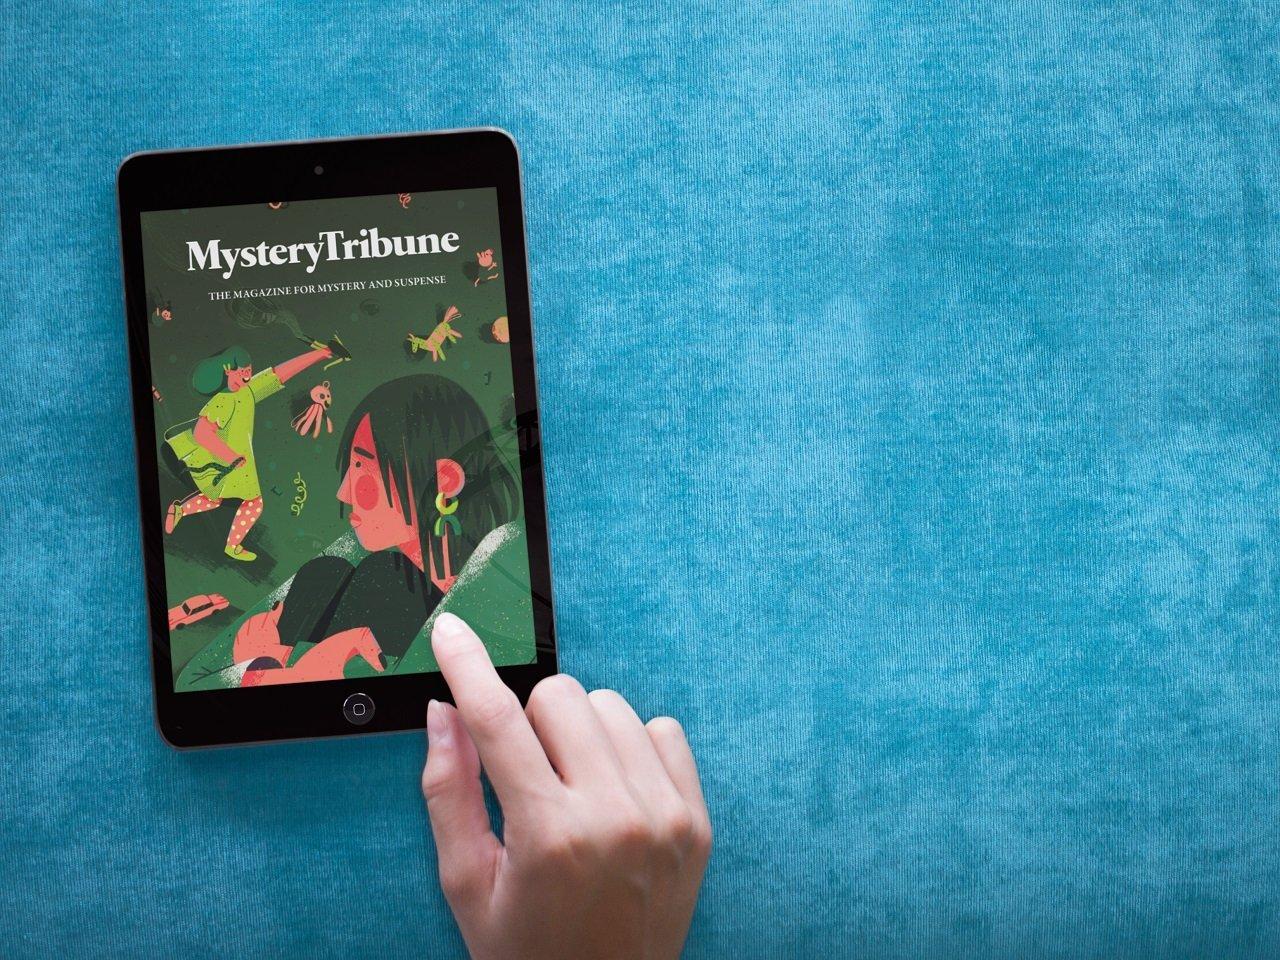 mystery tribune issue #12 2 release digital